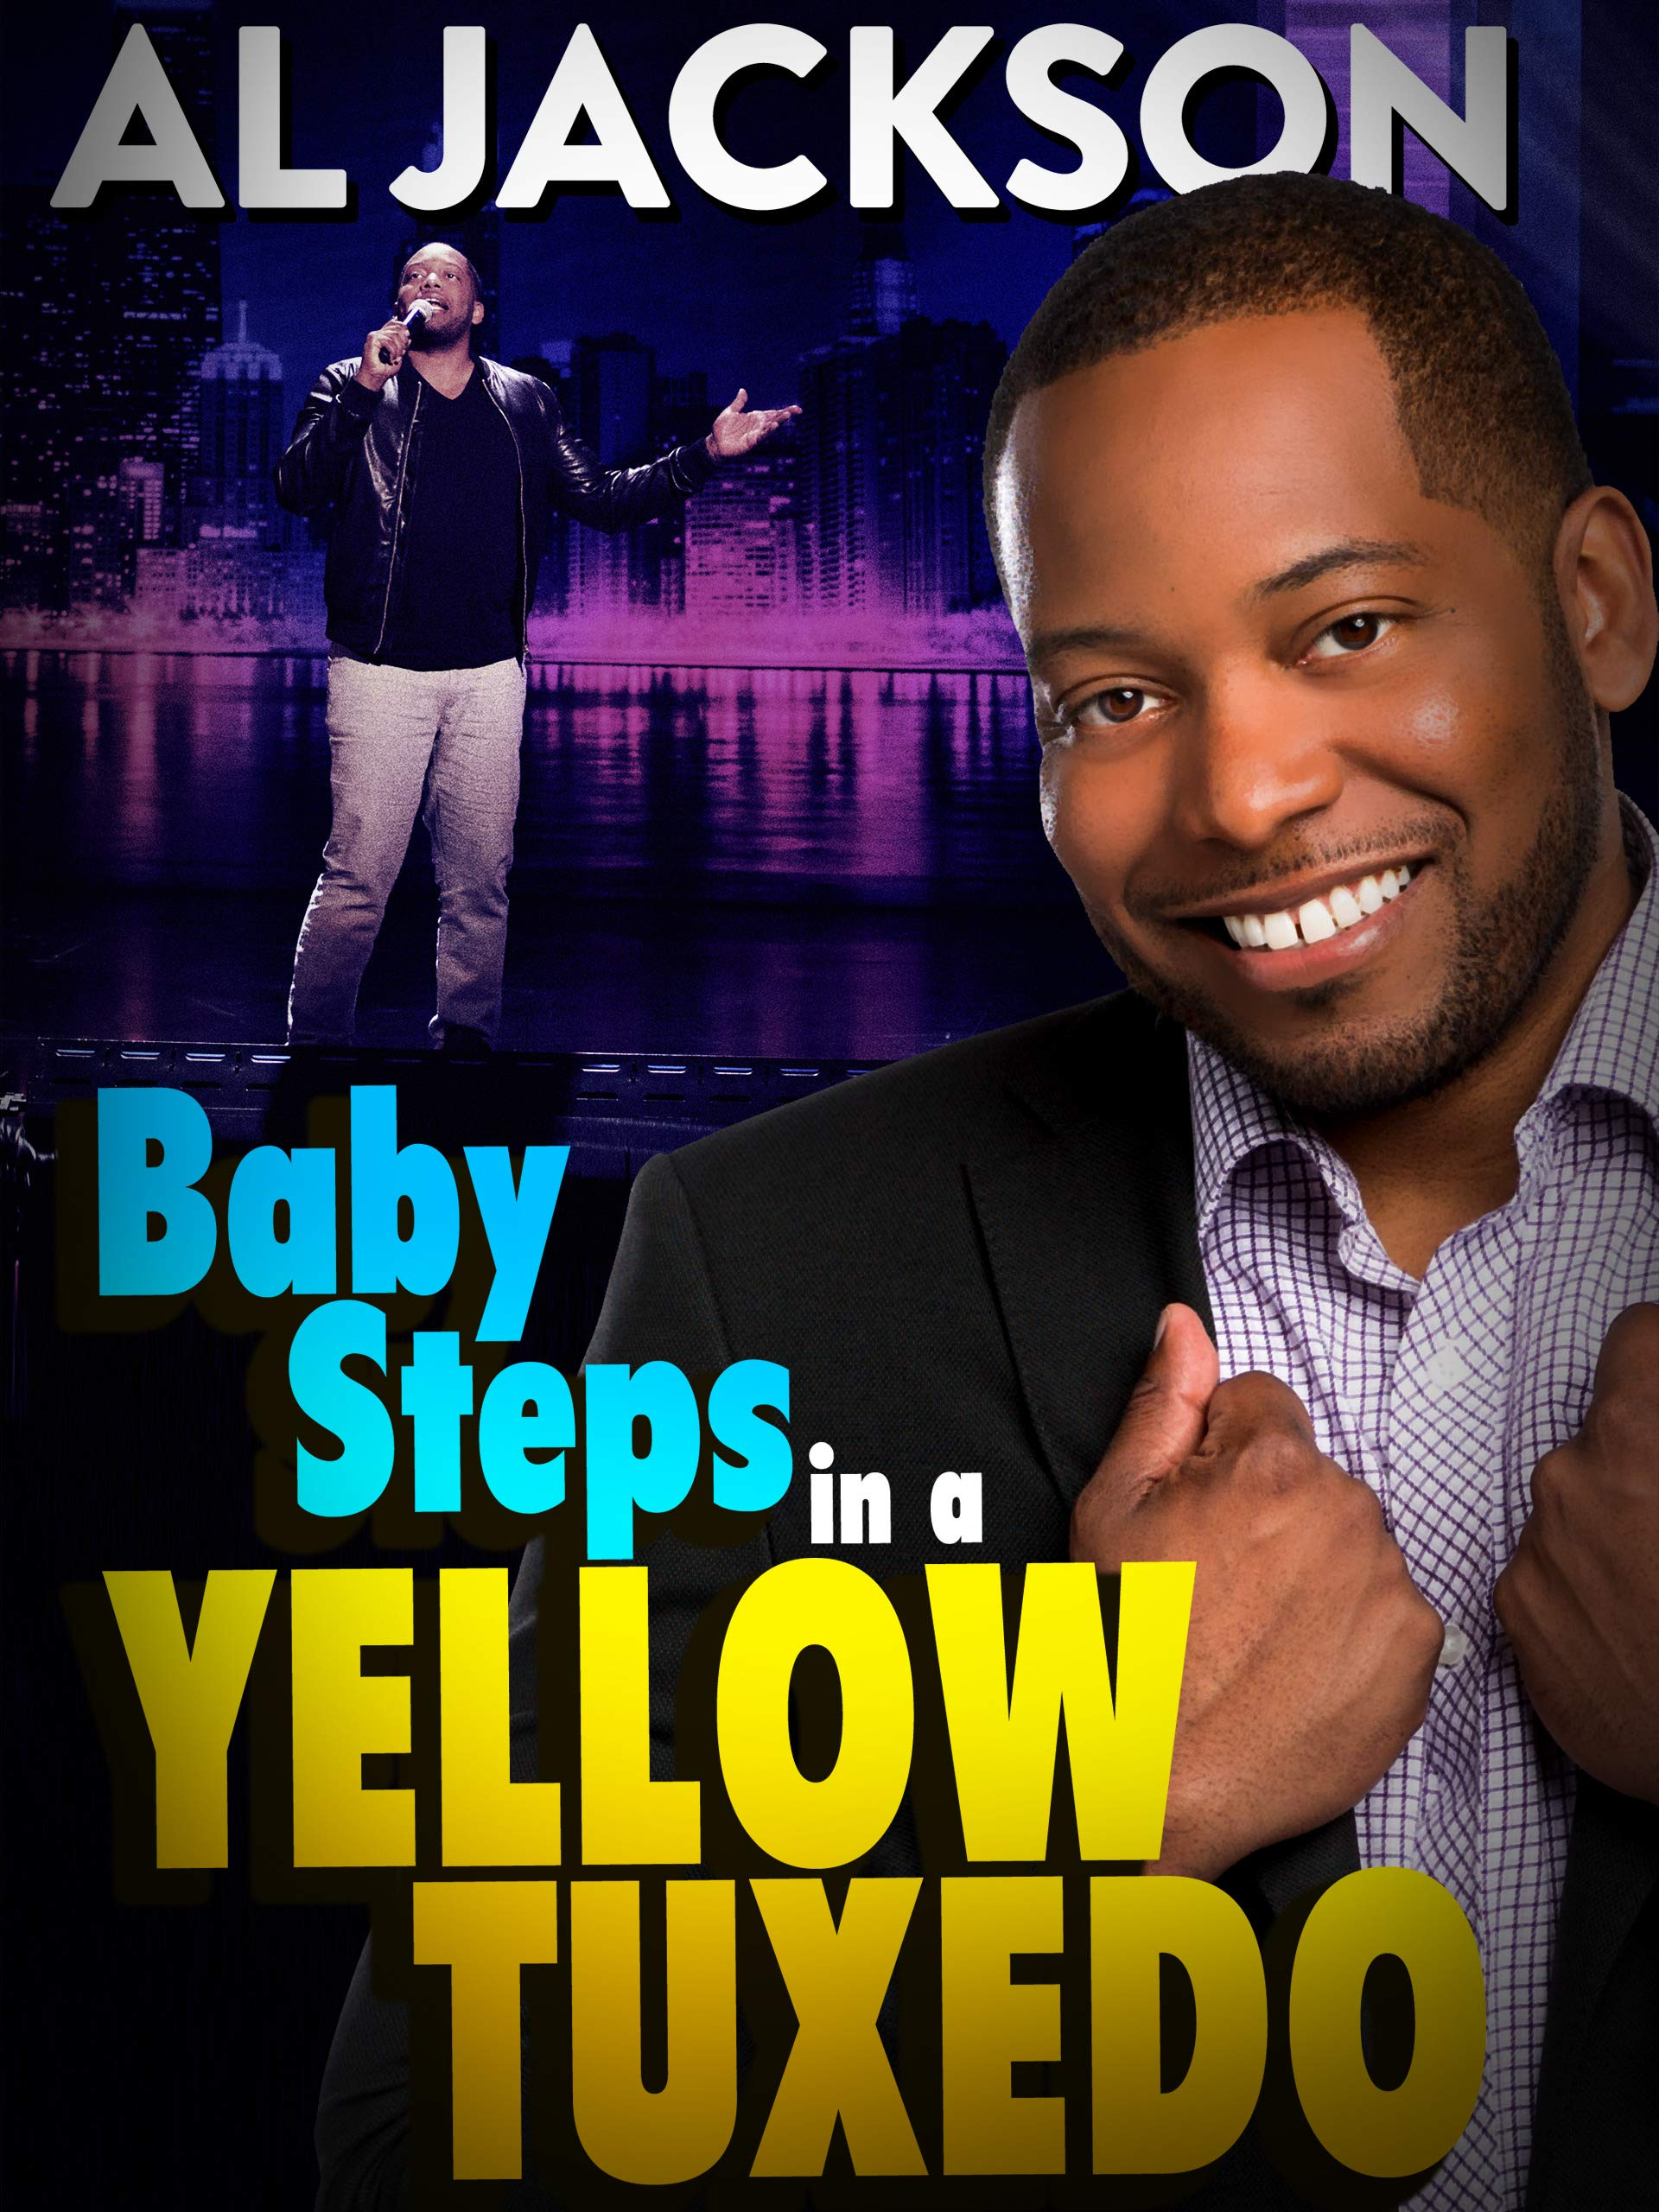 Al Jackson: Baby Steps in a Yellow Tuxedo on Amazon Prime Instant Video UK